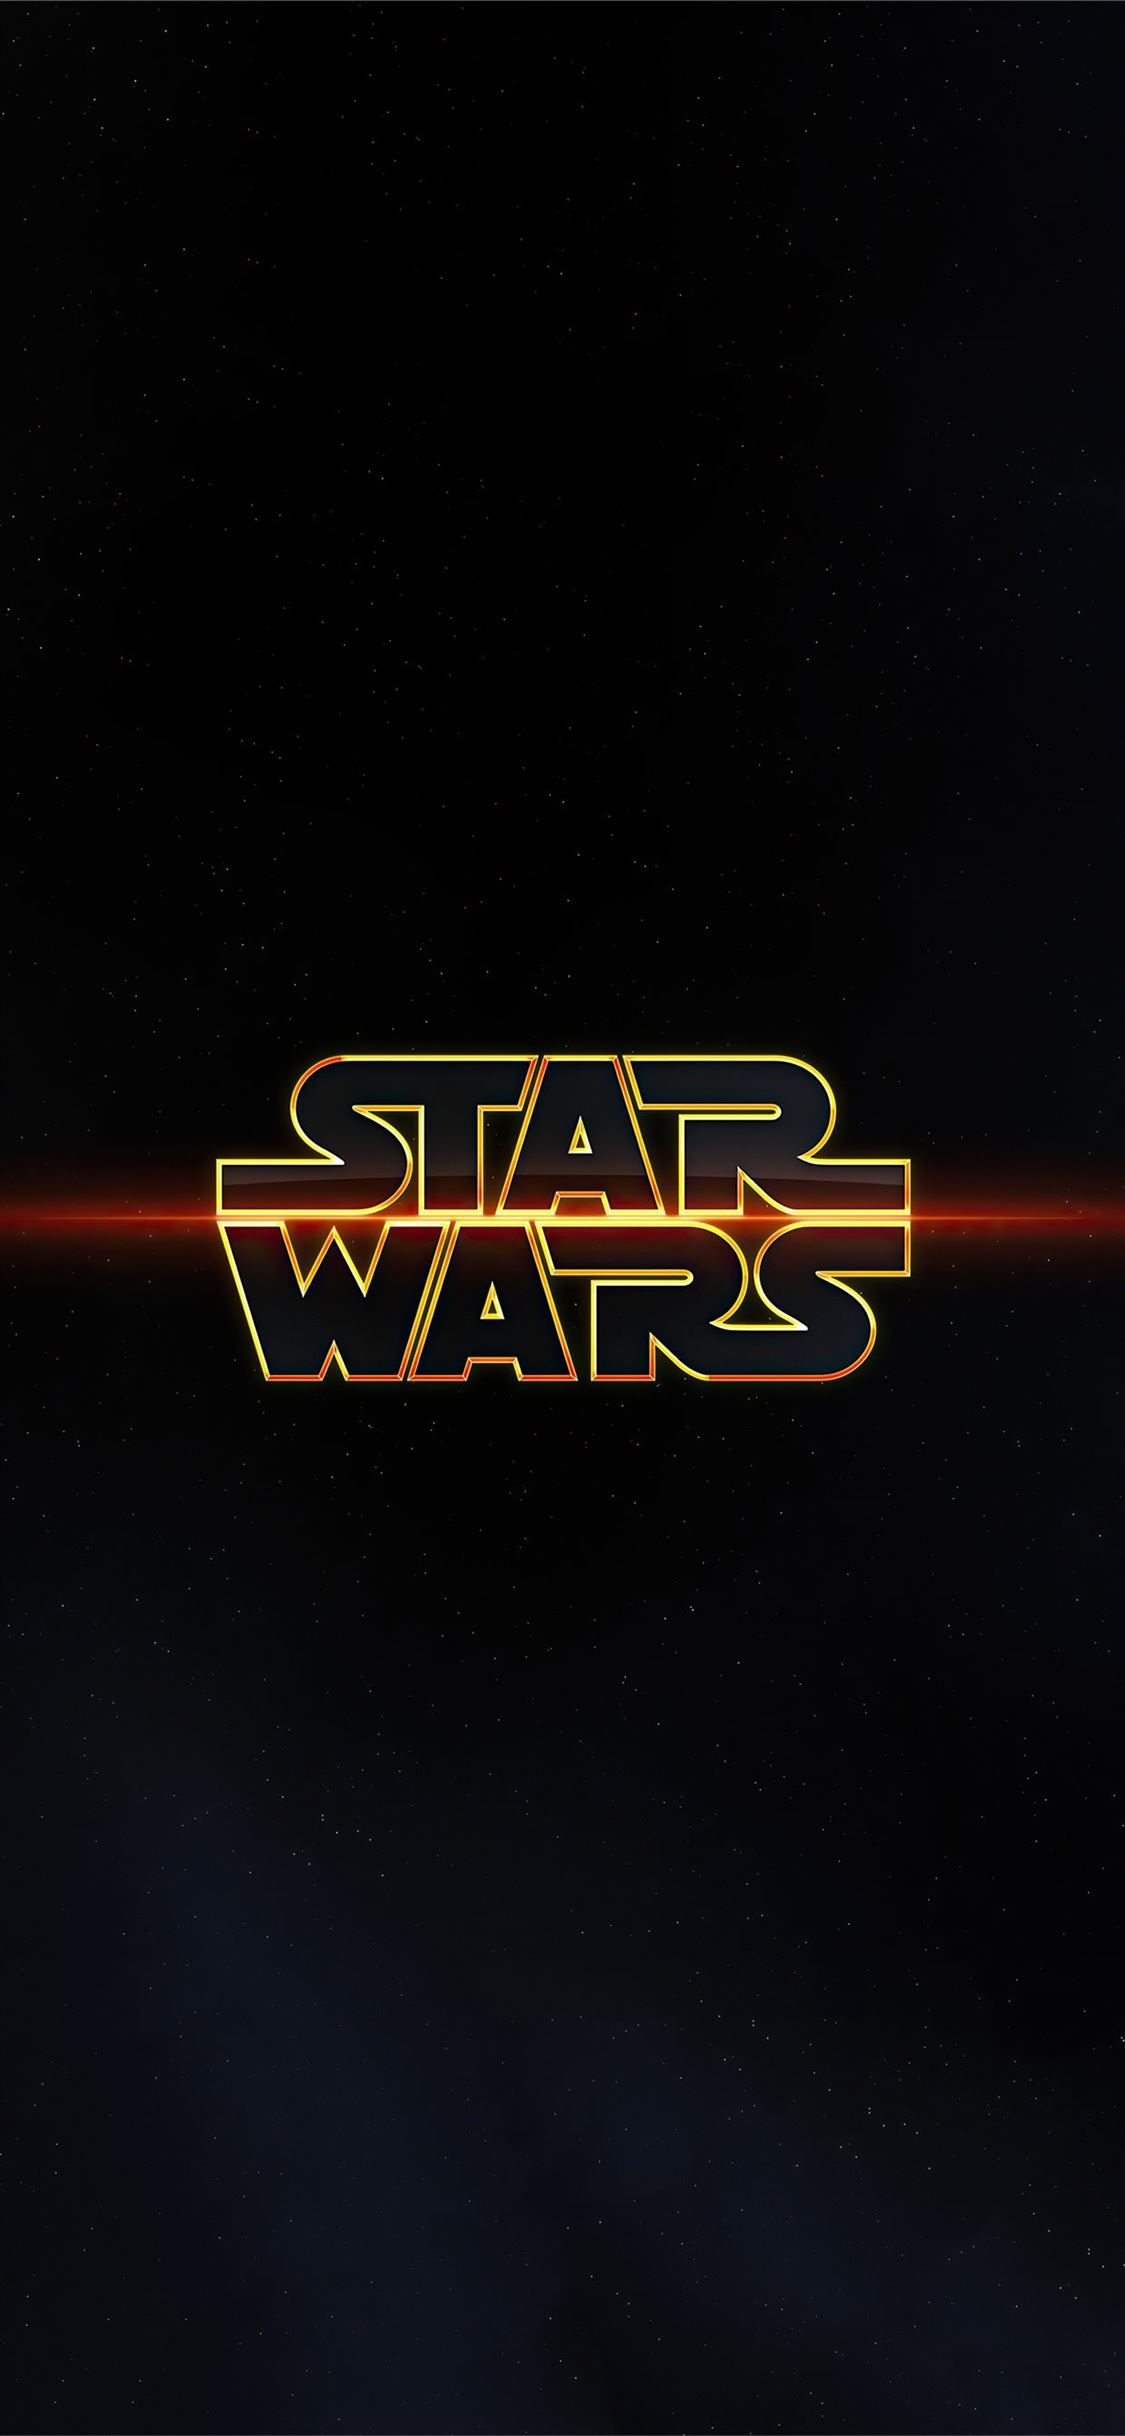 Star Wars Star Wars The Rise Of Skywalker Jedi Kylo Ren Lightsaber Rey Star In 2021 Star Wars Wallpaper Star Wars Background Star Wars Rise Of Skywalker Wallpaper